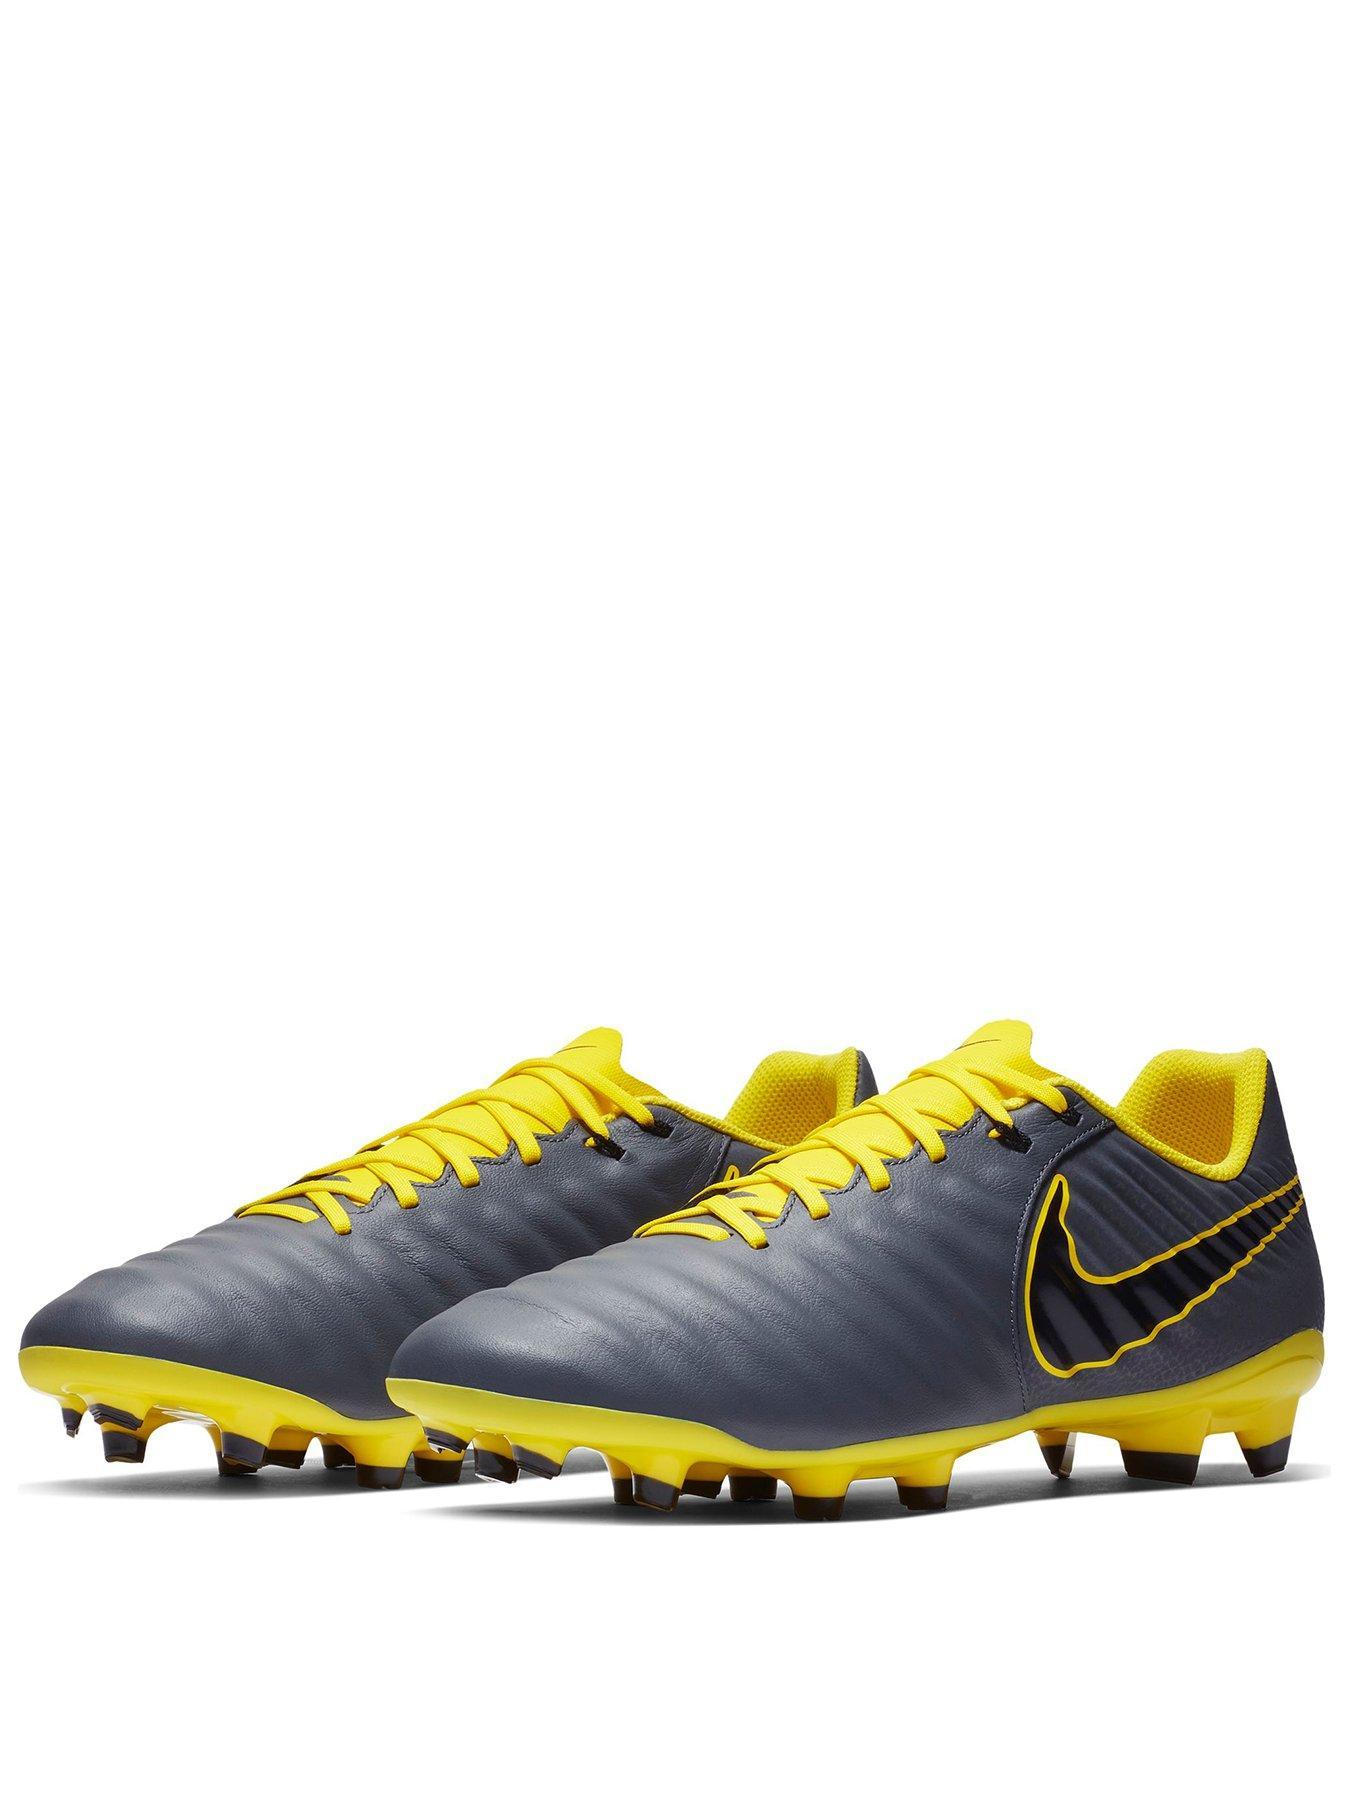 Nike Men's Football Boots Yellow YellowPurple Yellow Size